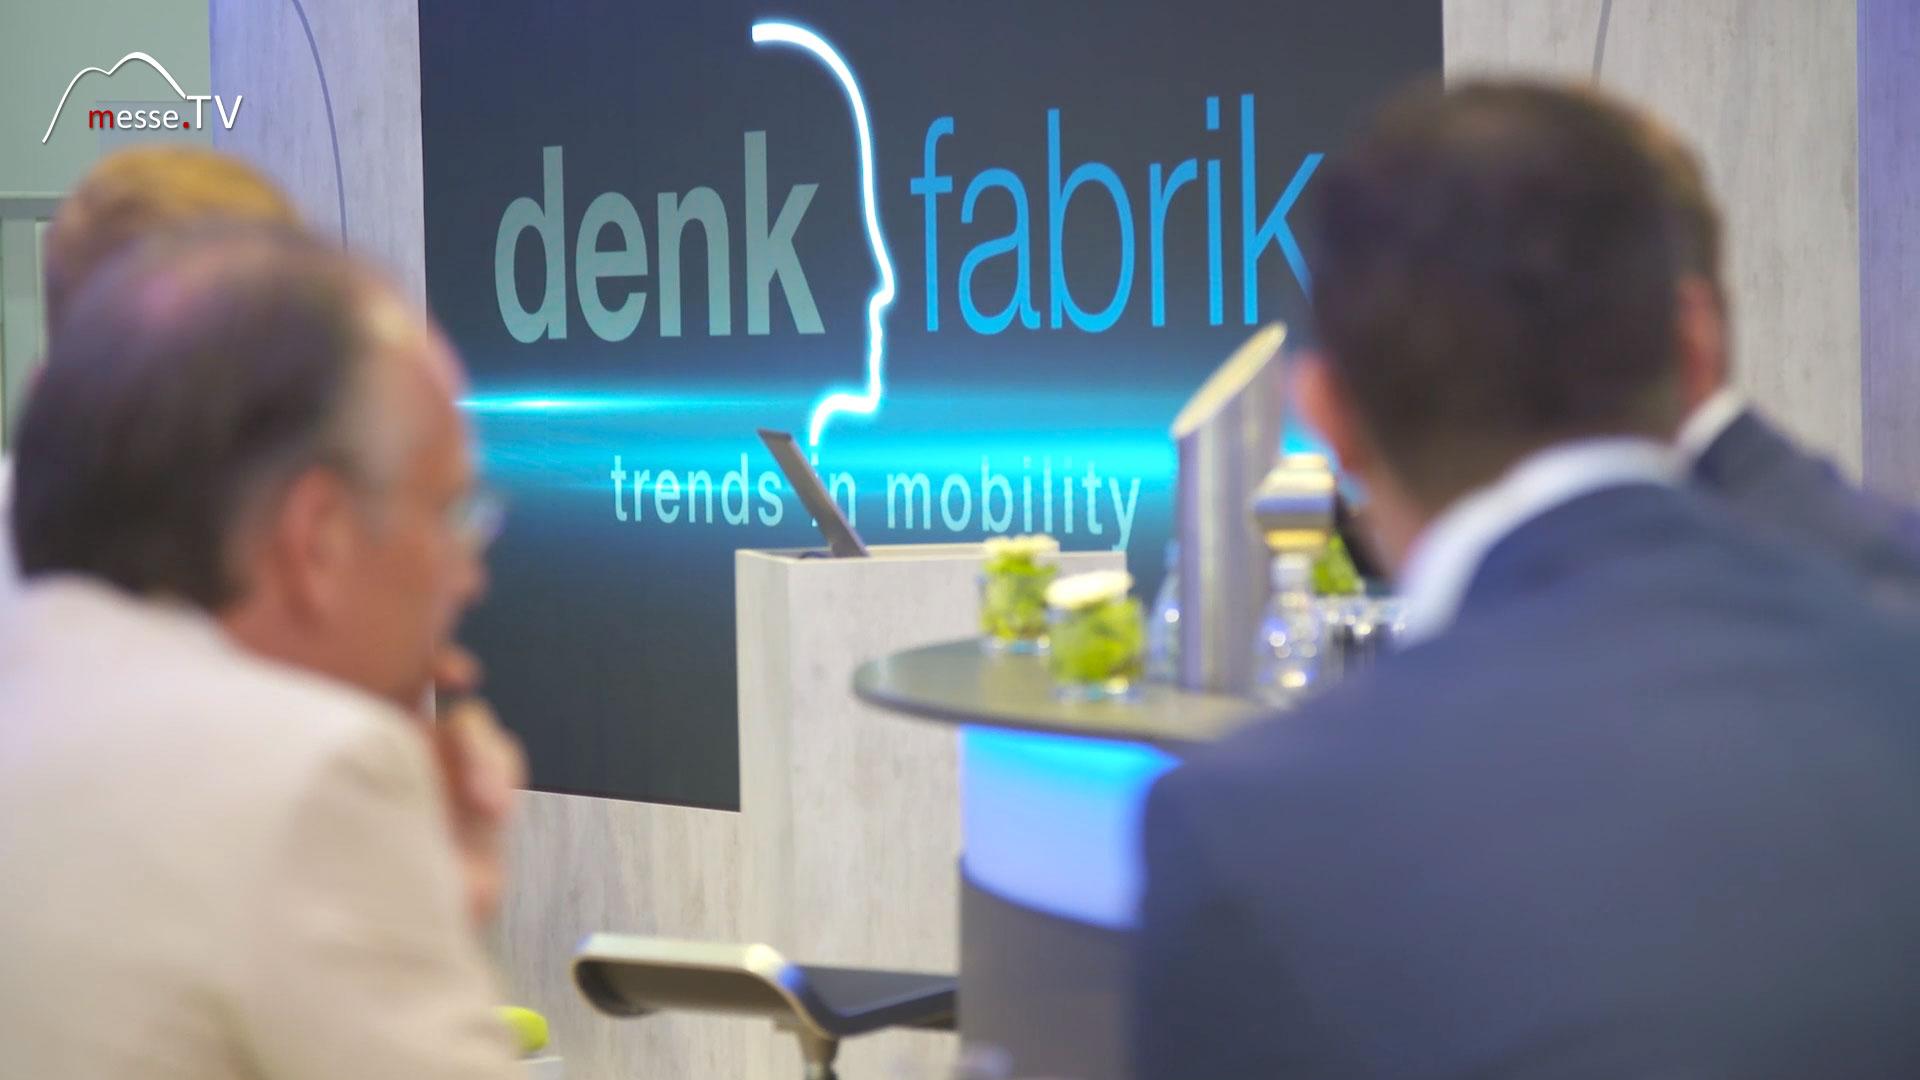 KRONE Denkfabrik trends in mobility